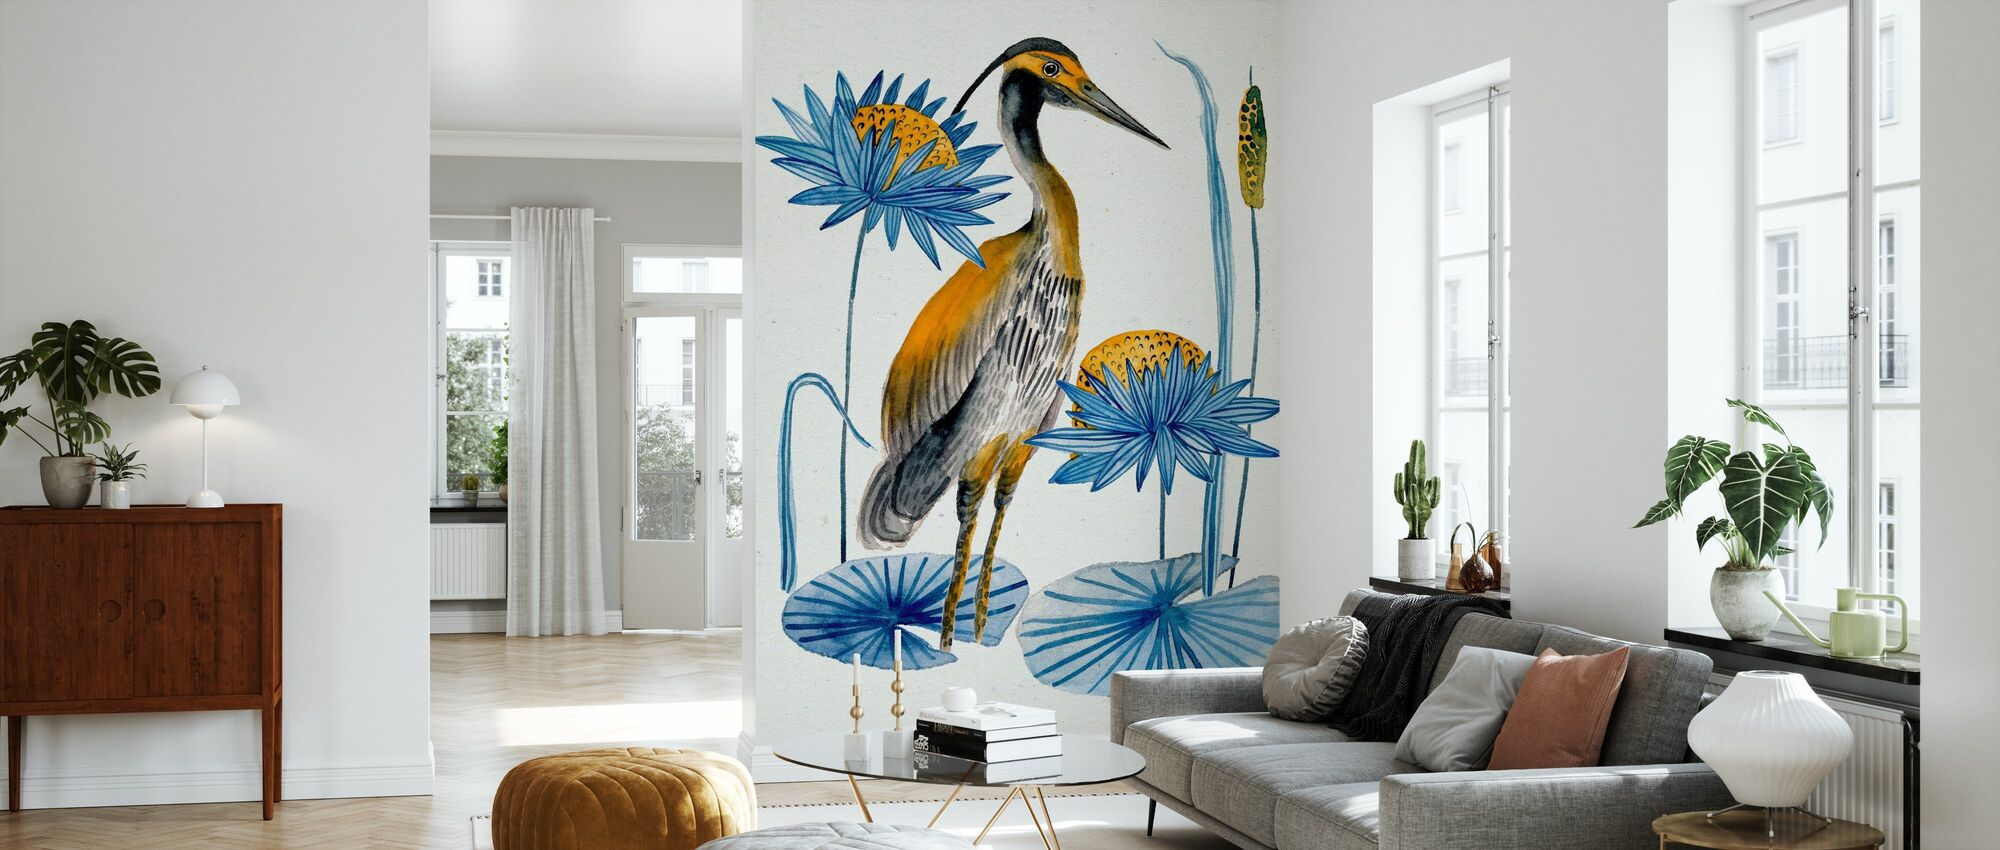 Heron Pond - Wallpaper - Living Room